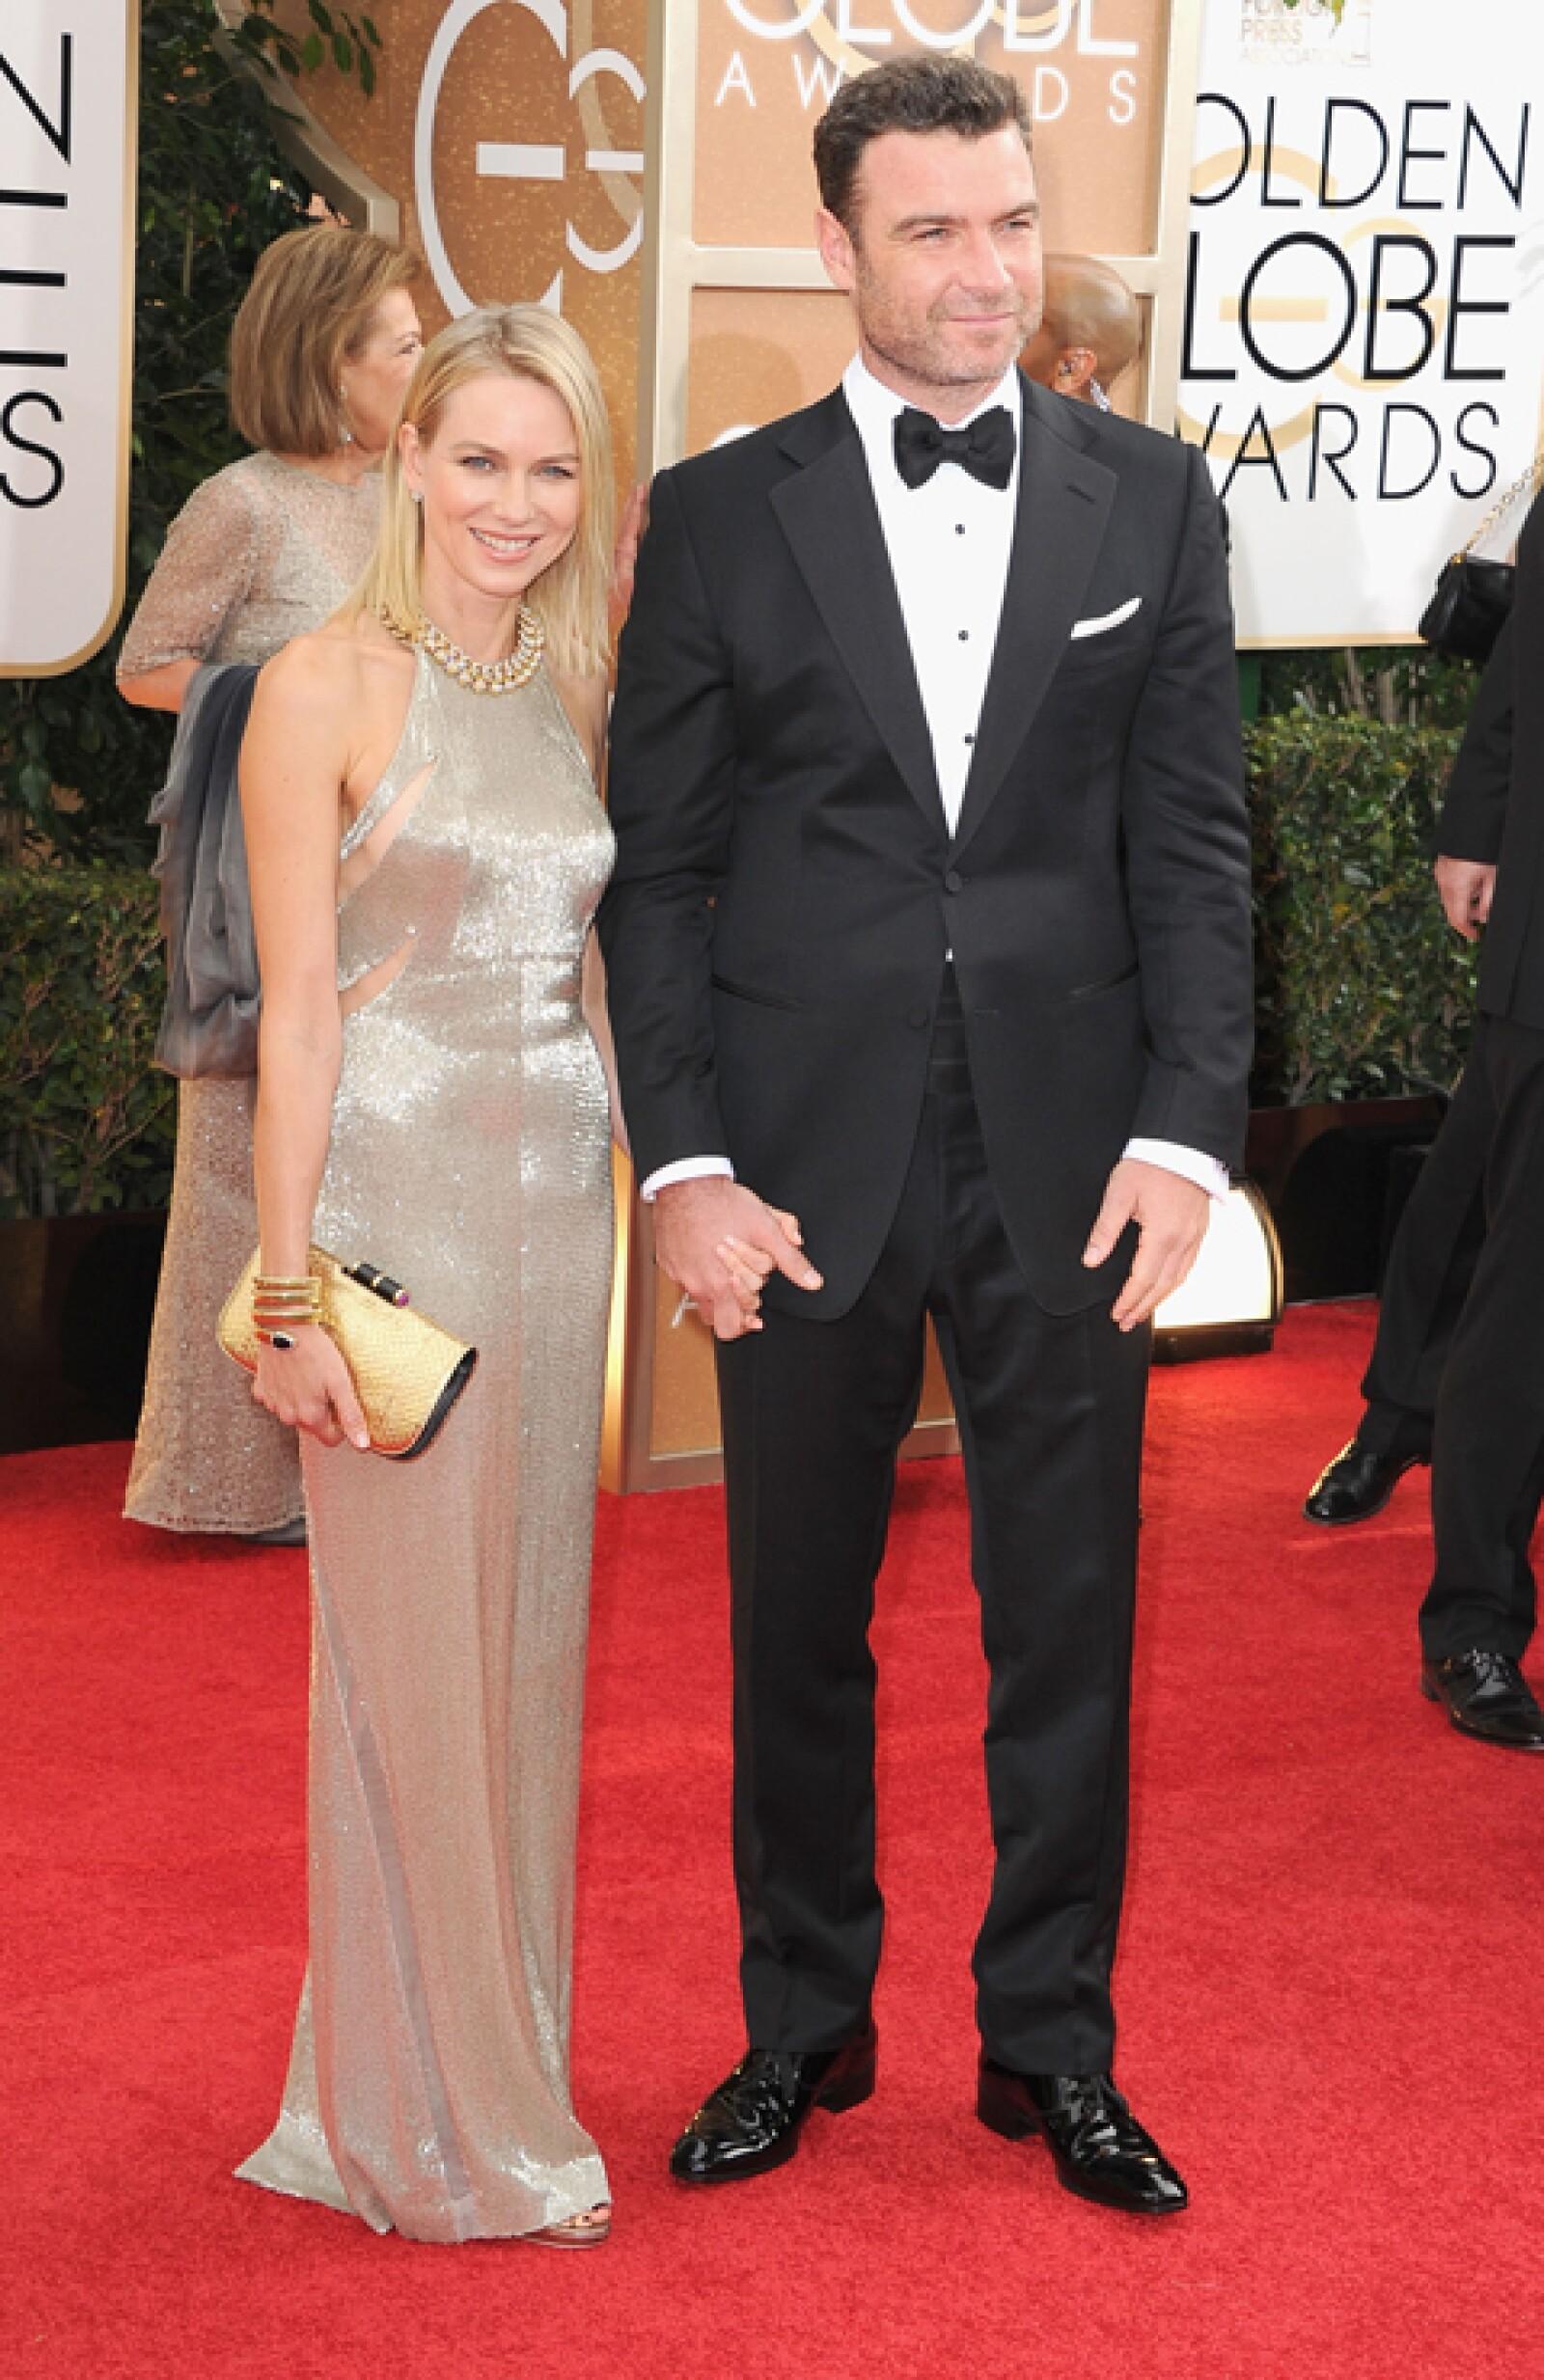 Naomi Watts llegó viéndose espectacular junto a su esposo Liev Schreiber.